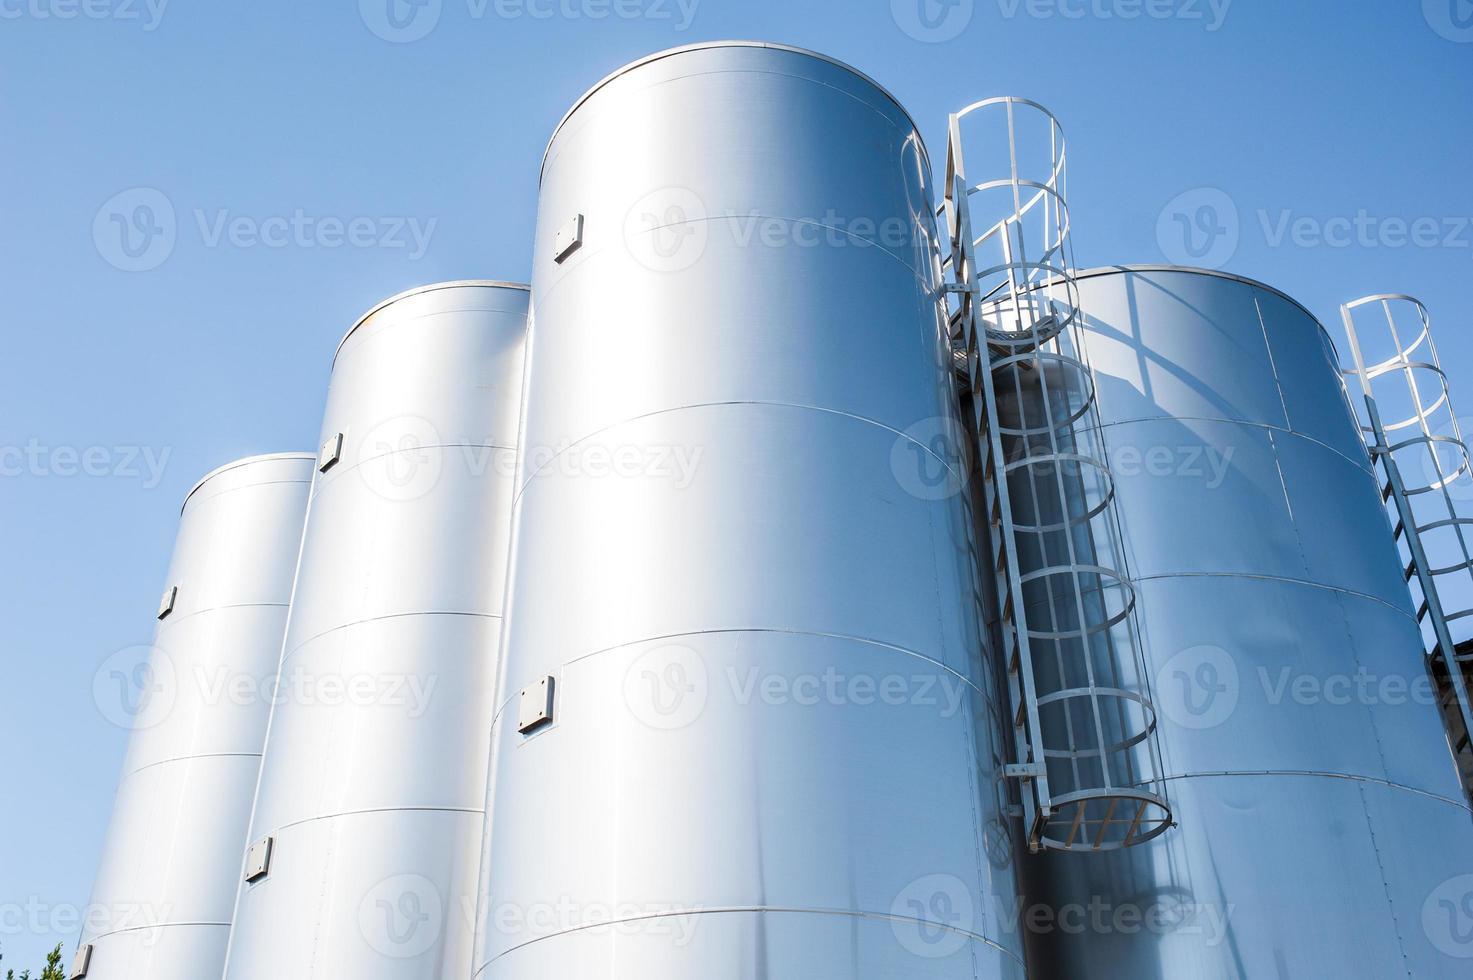 chemische fabriek, containers foto